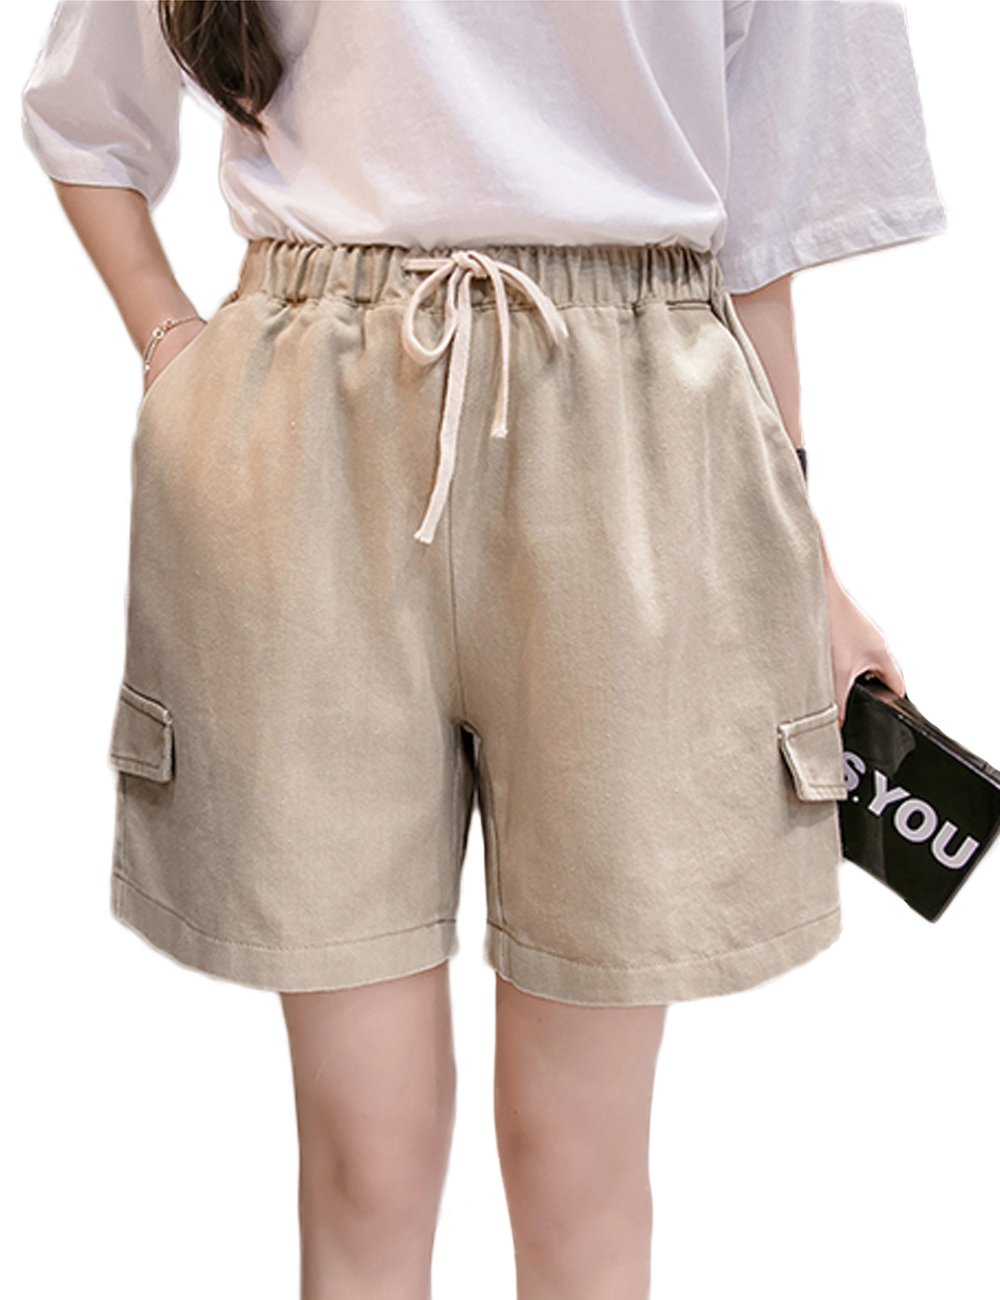 Innifer Women's Basic Elastic Waist Comfy Cotton Linen Casual Cargo Shorts